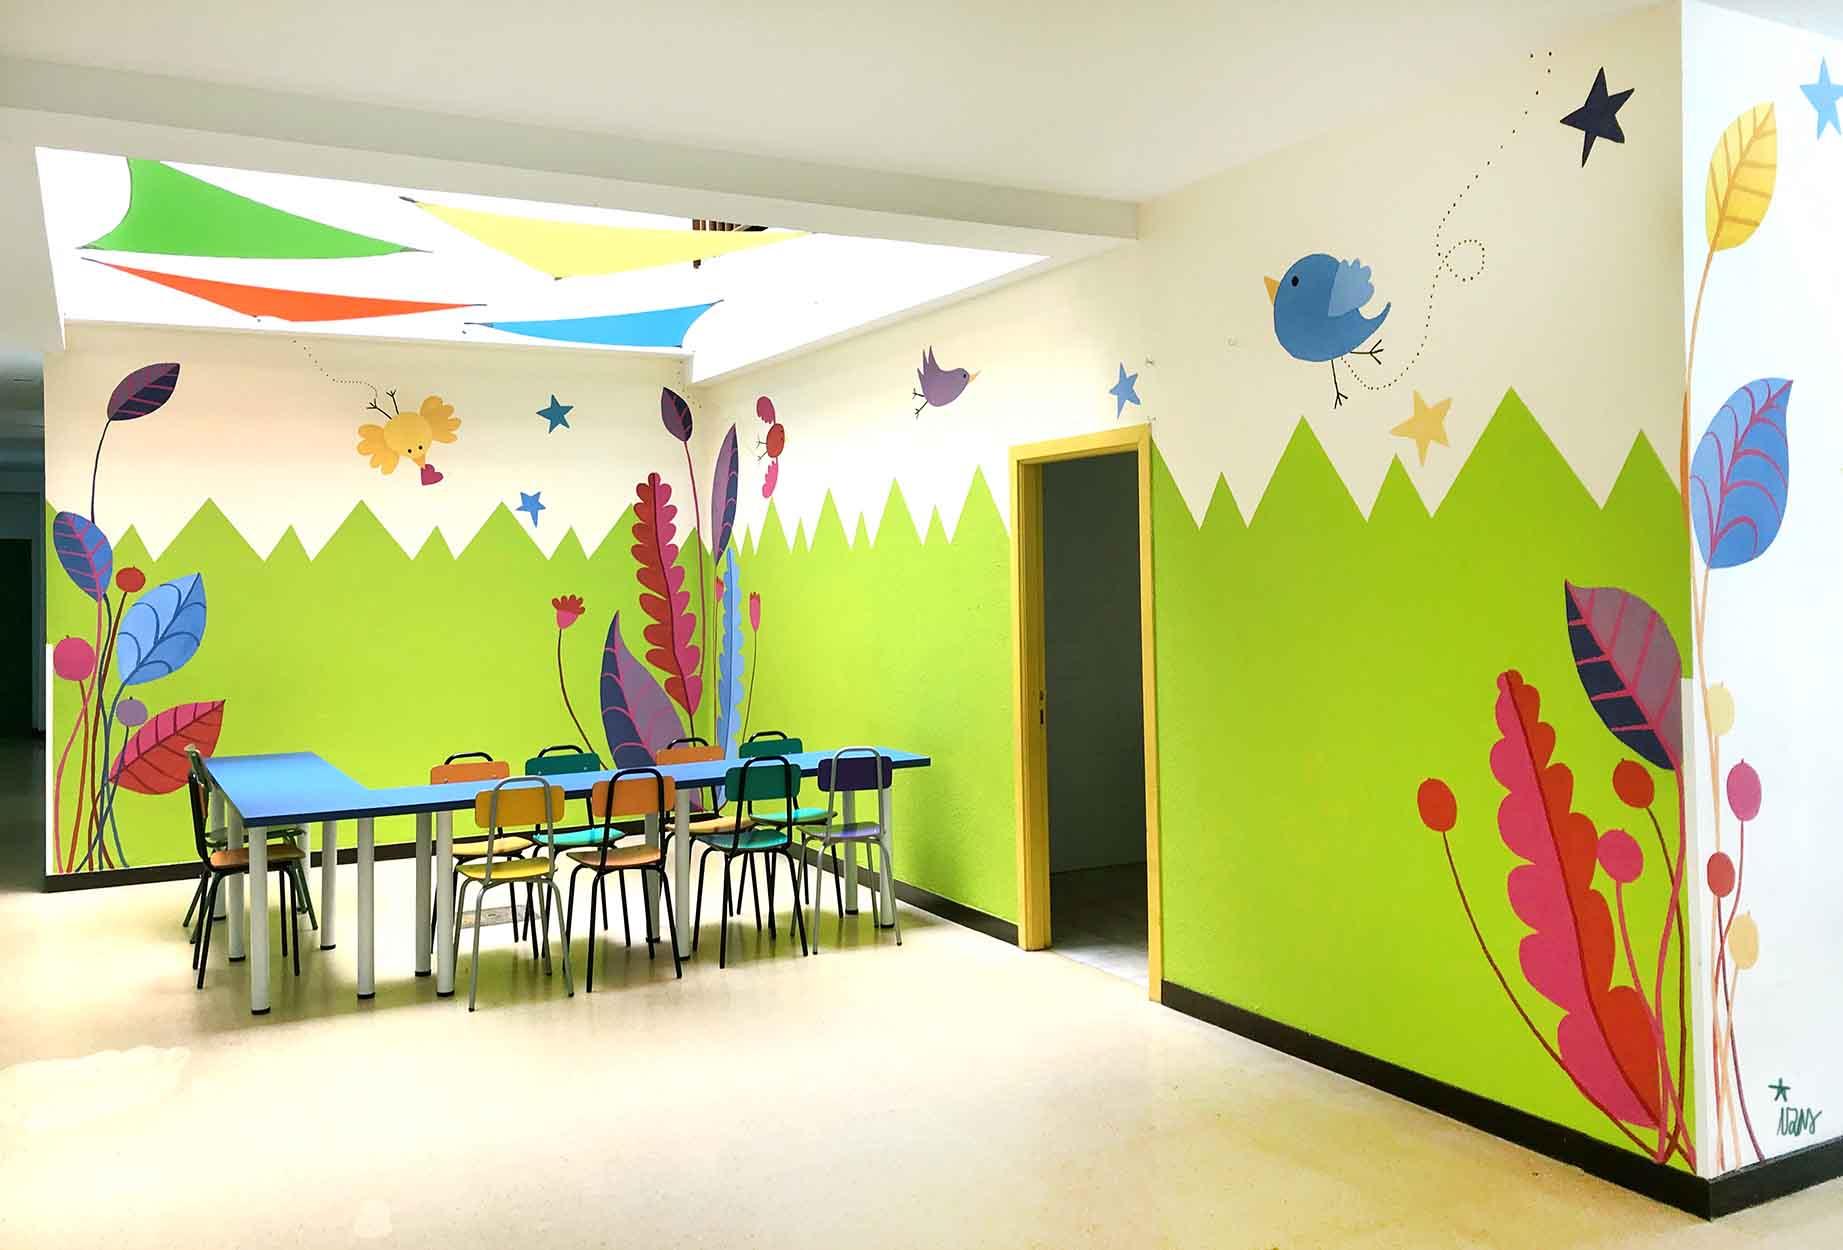 mural izas gerardo diego interior 2